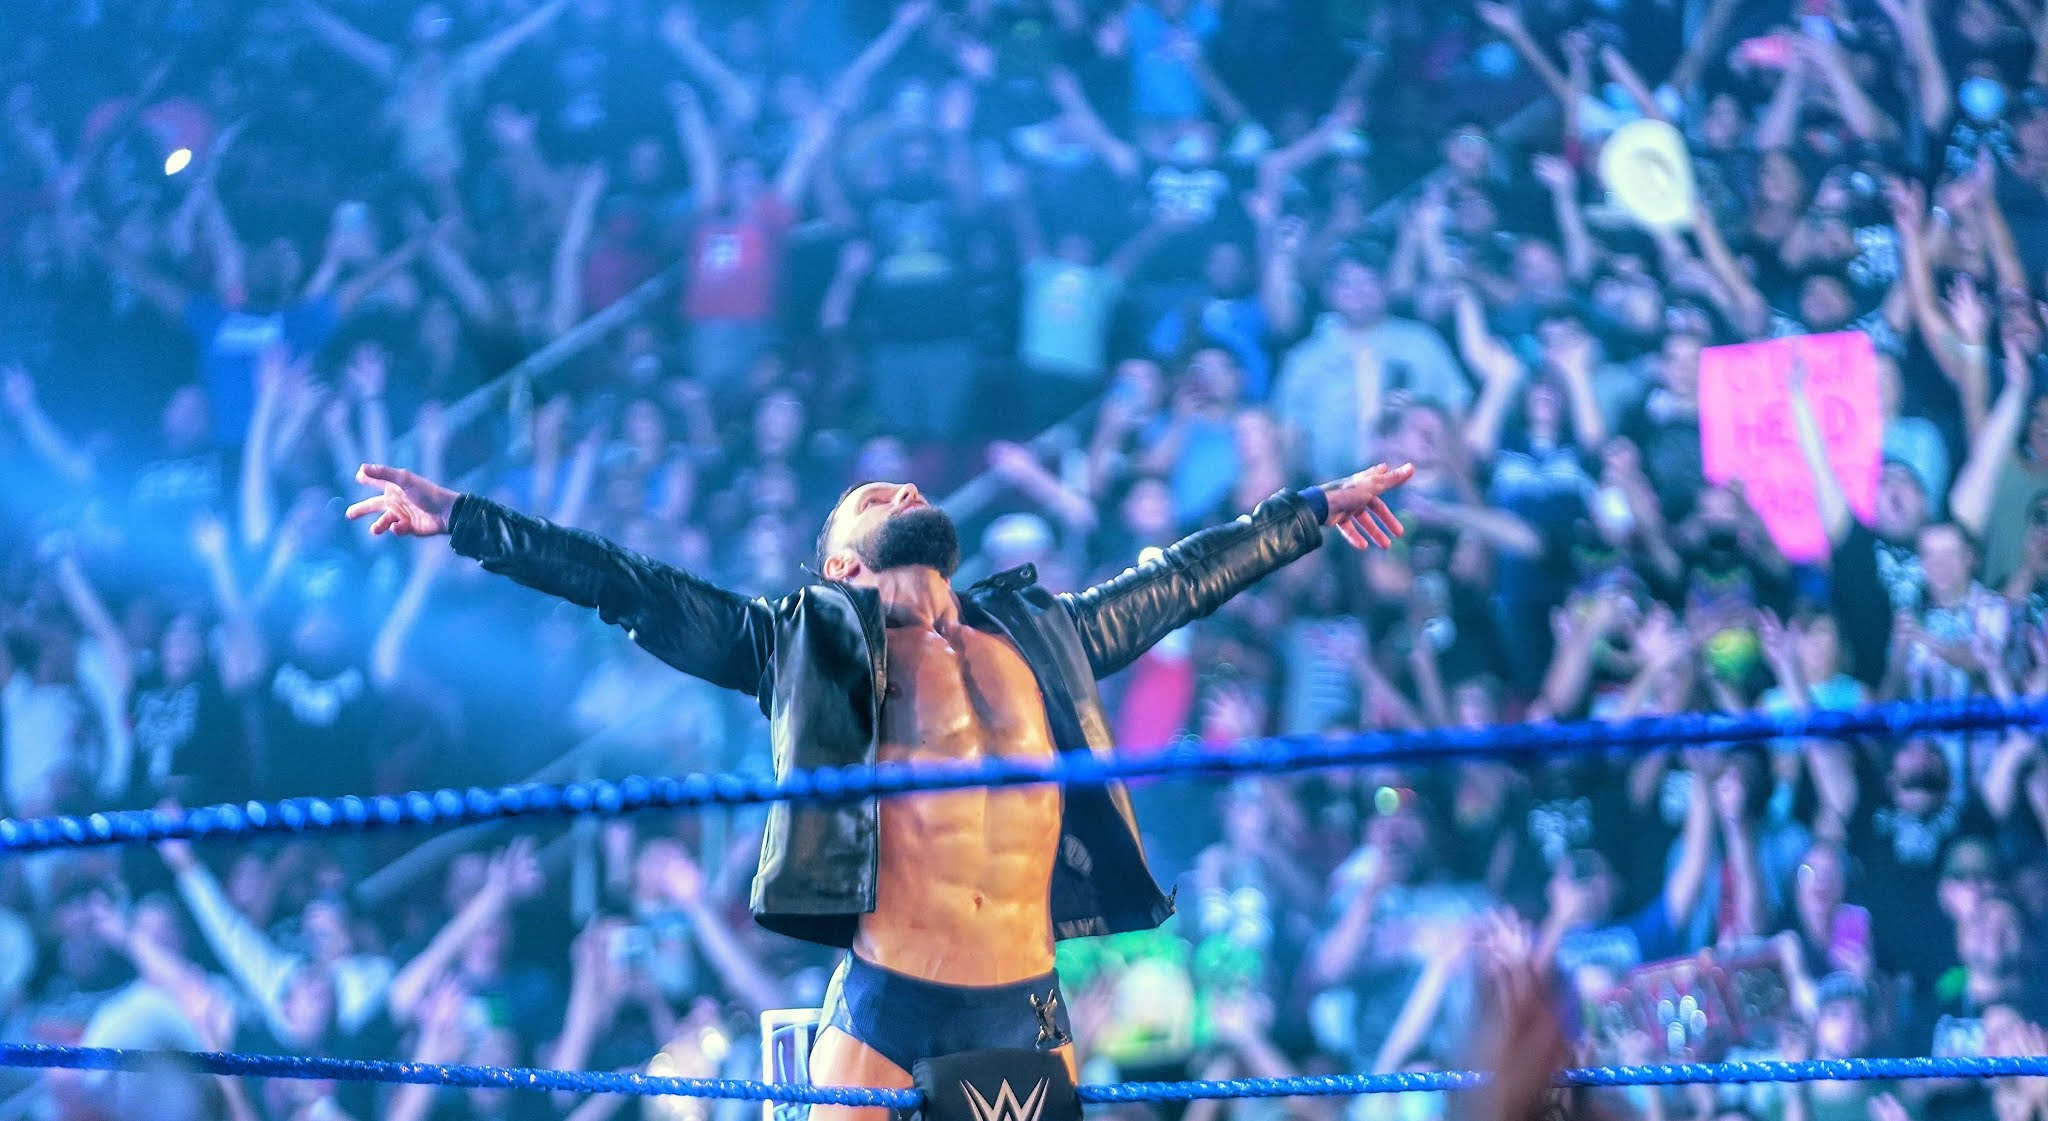 Finn Bálor destrói Sami Zayn em seu retorno ao Friday Night SmackDown